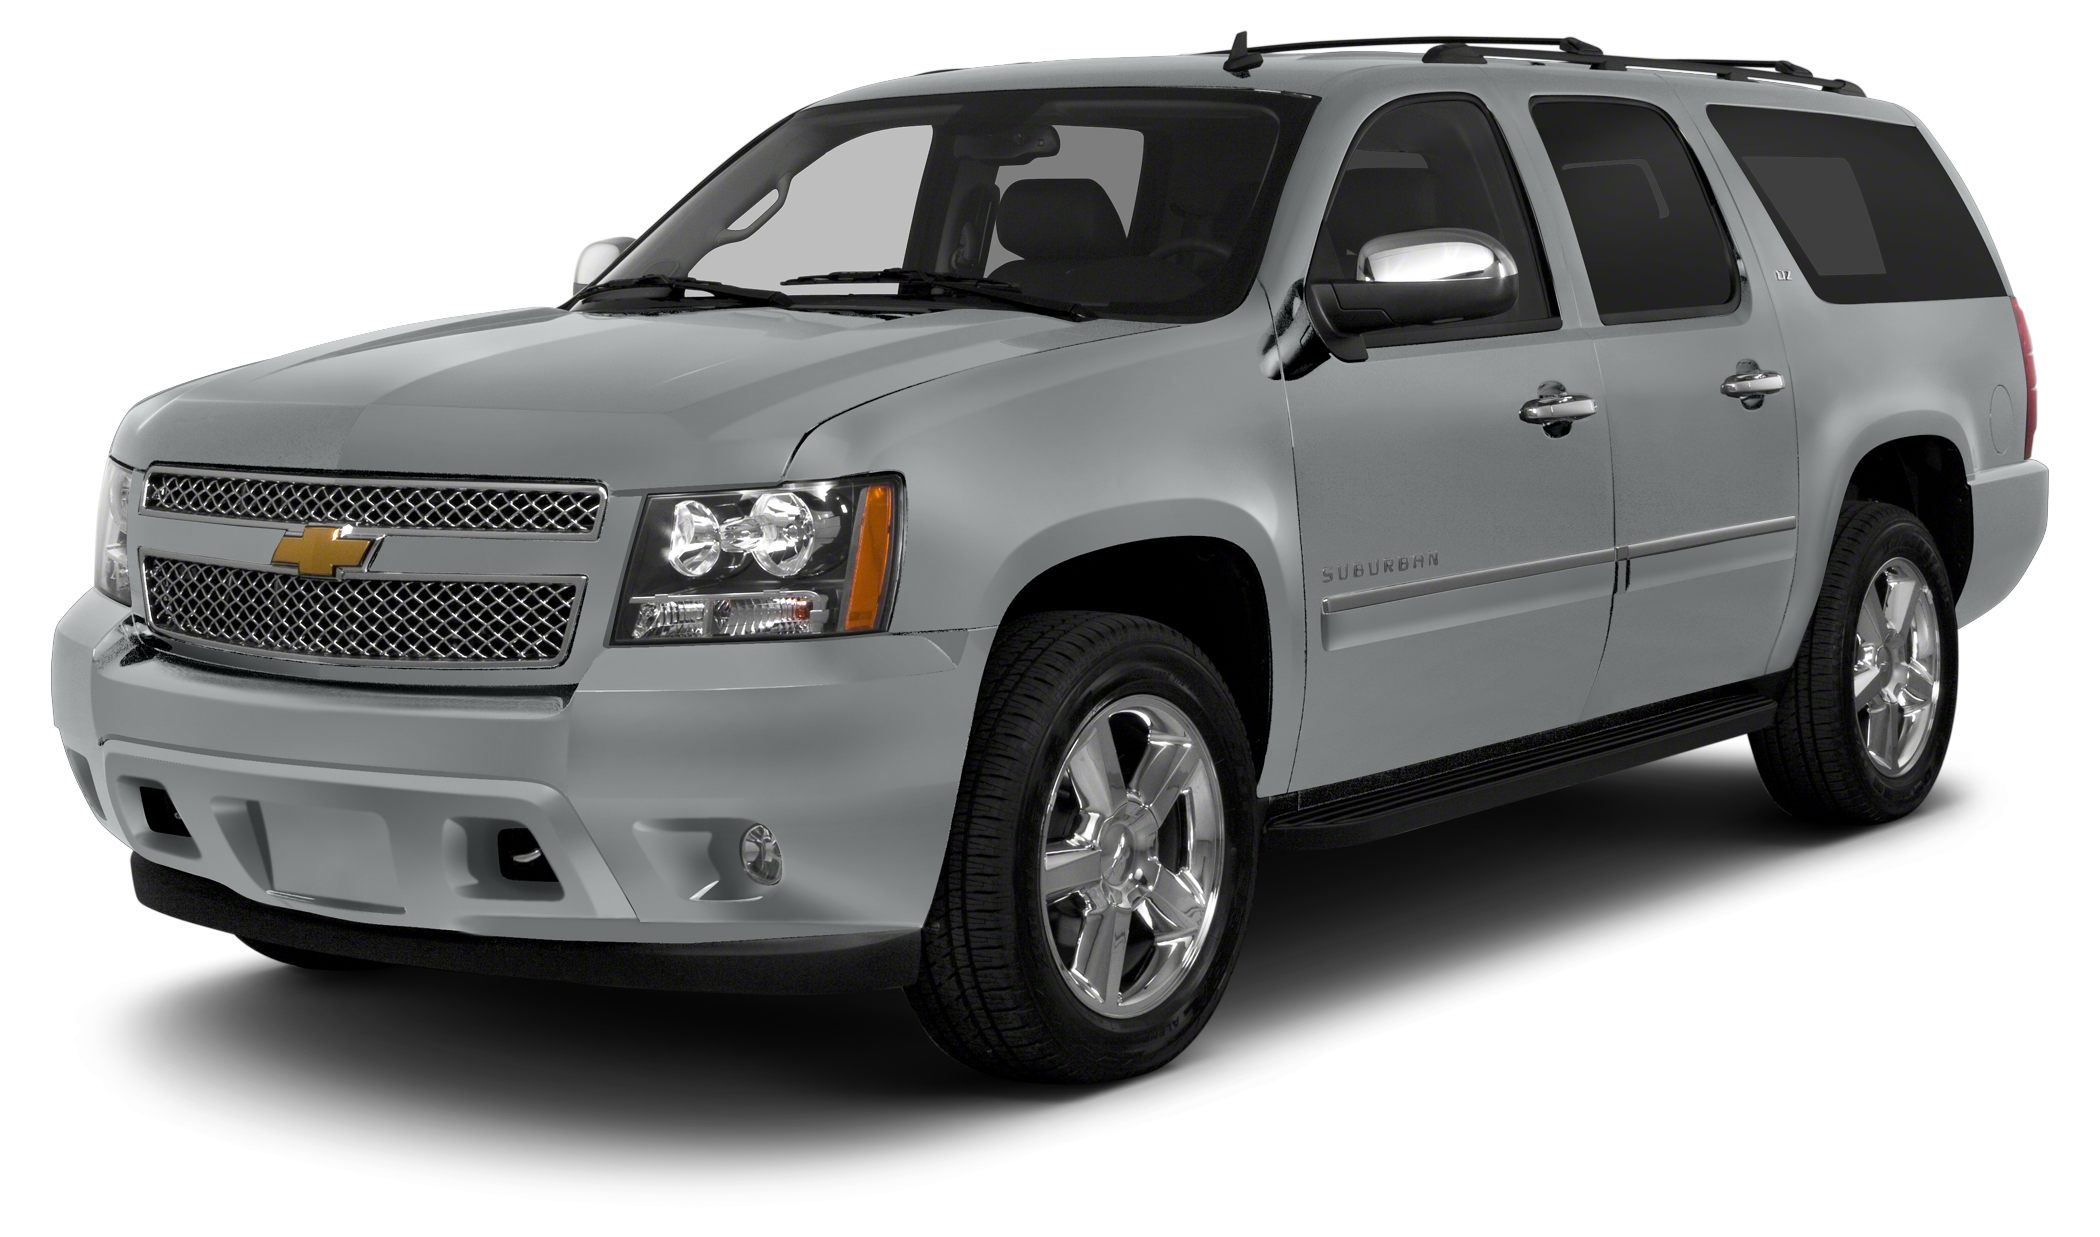 2013 Chevrolet Suburban 1500 LTZ Miles 39300Color Silver Stock 78953A VIN 1GNSCKE07DR112212